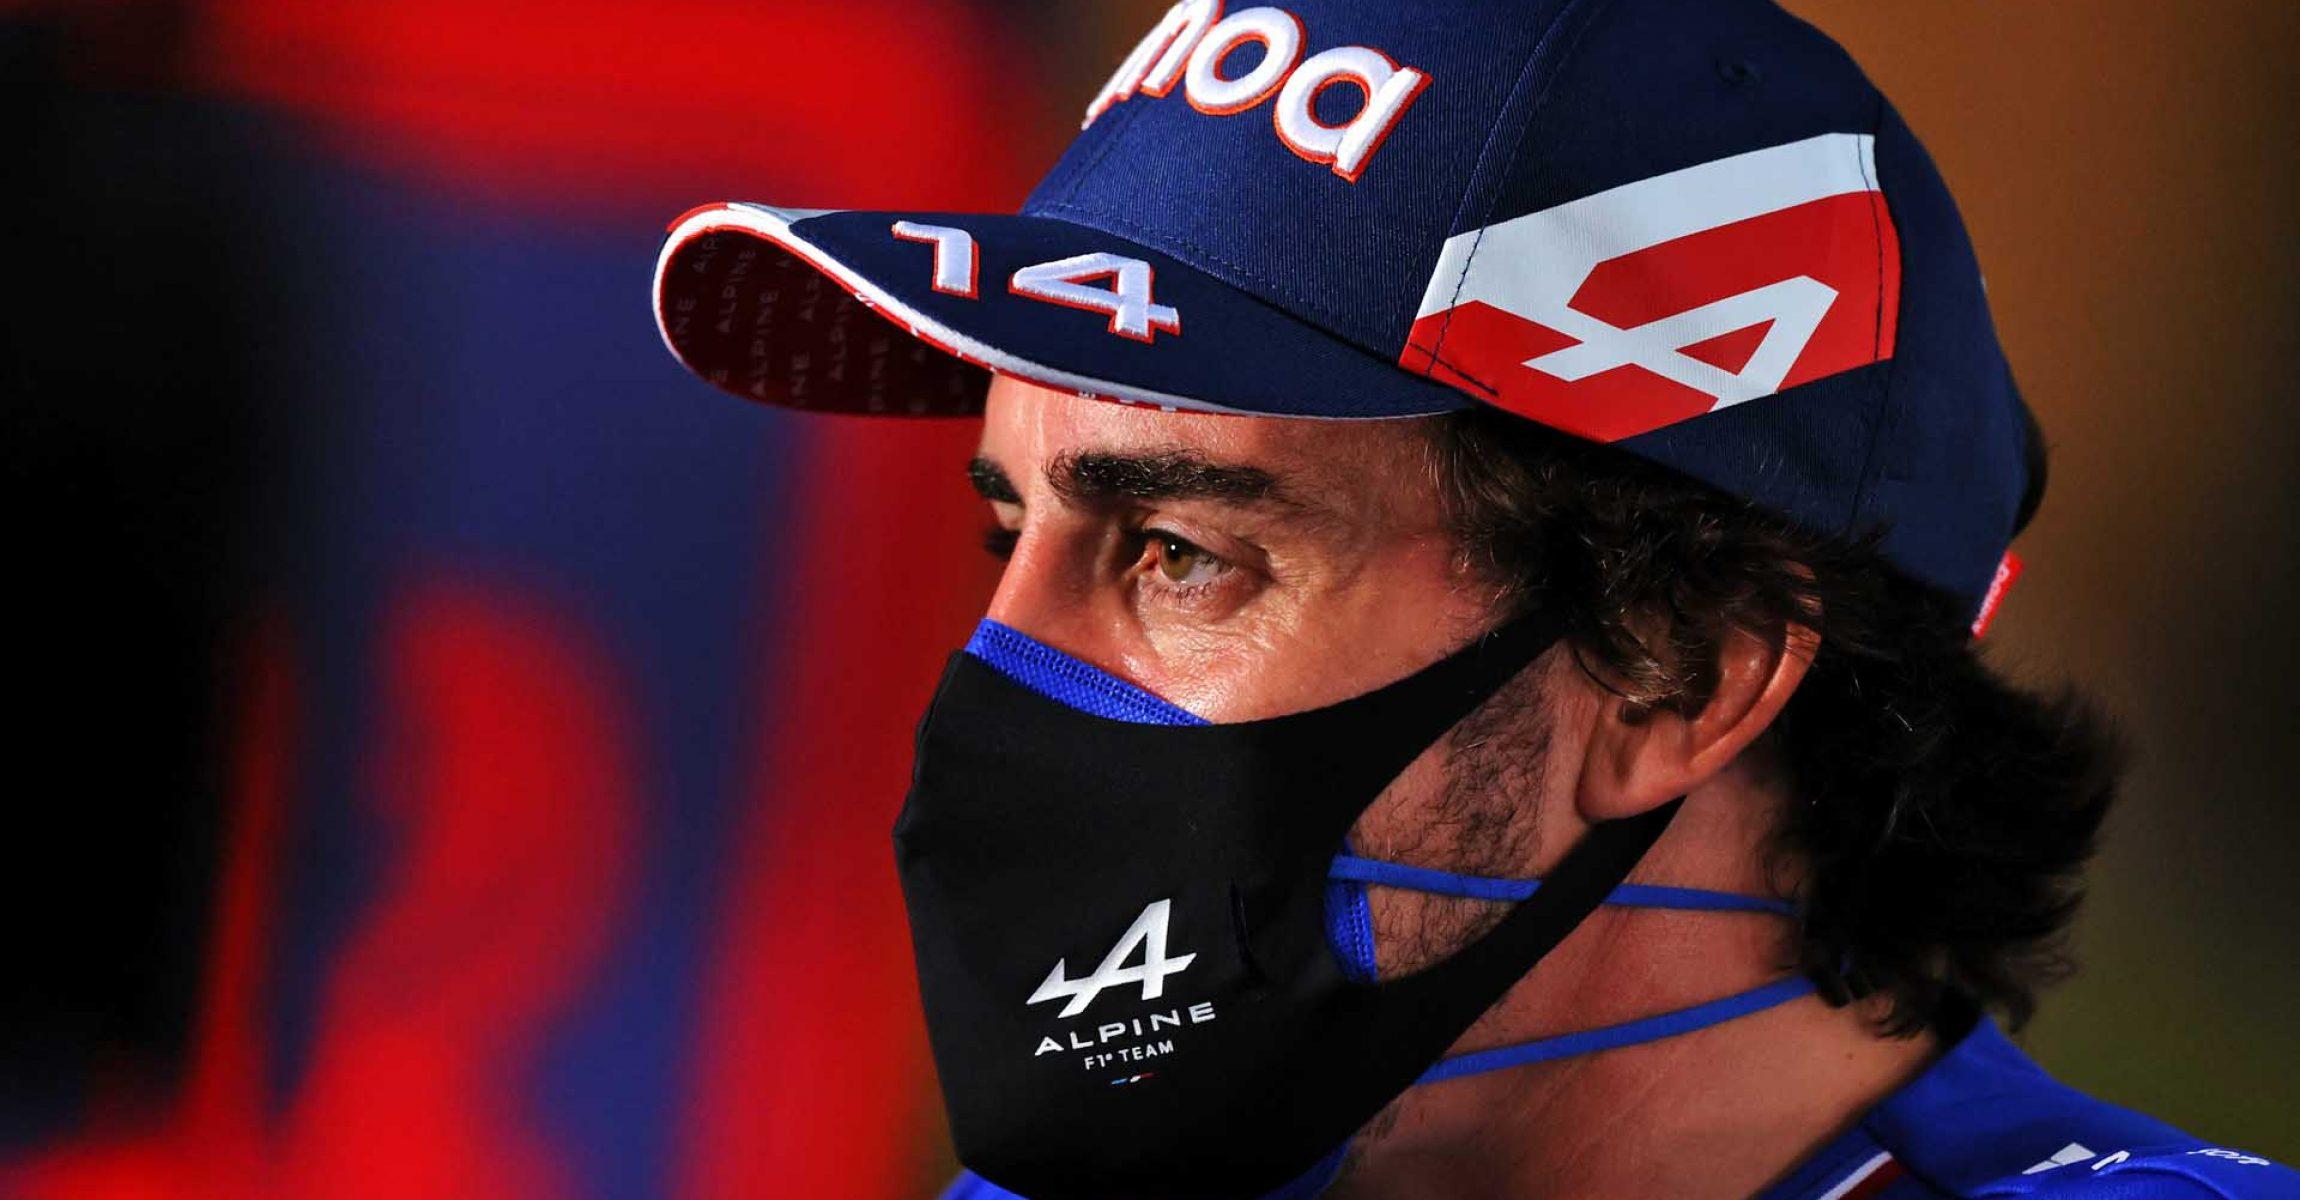 Fernando Alonso (ESP) Alpine F1 Team. Bahrain Grand Prix, Thursday 25th March 2021. Sakhir, Bahrain.